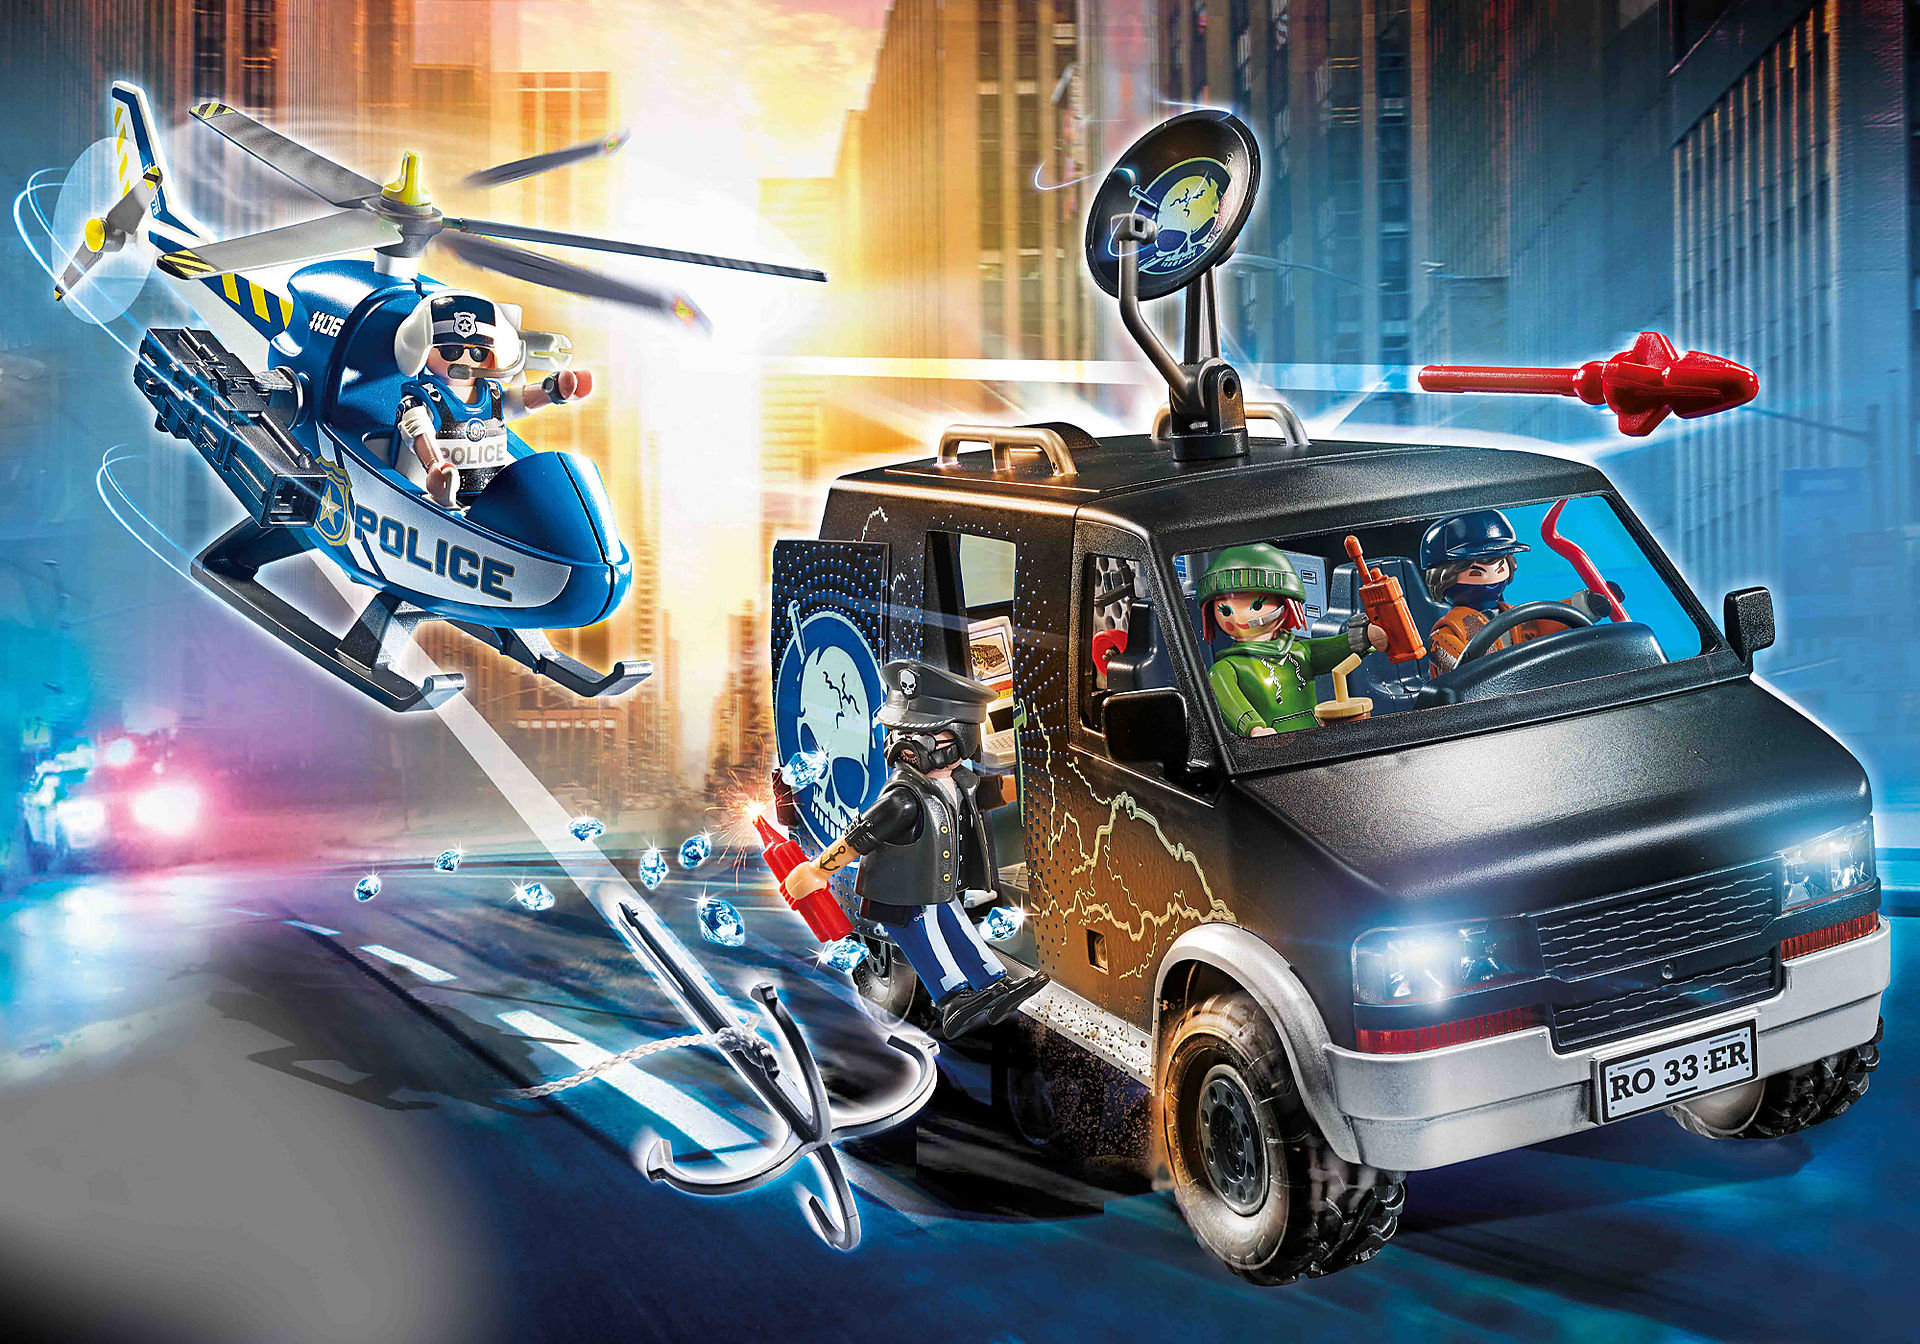 70575 Polizei-Helikopter: Verfolgung des Fluchtfahrzeugs zoom image1